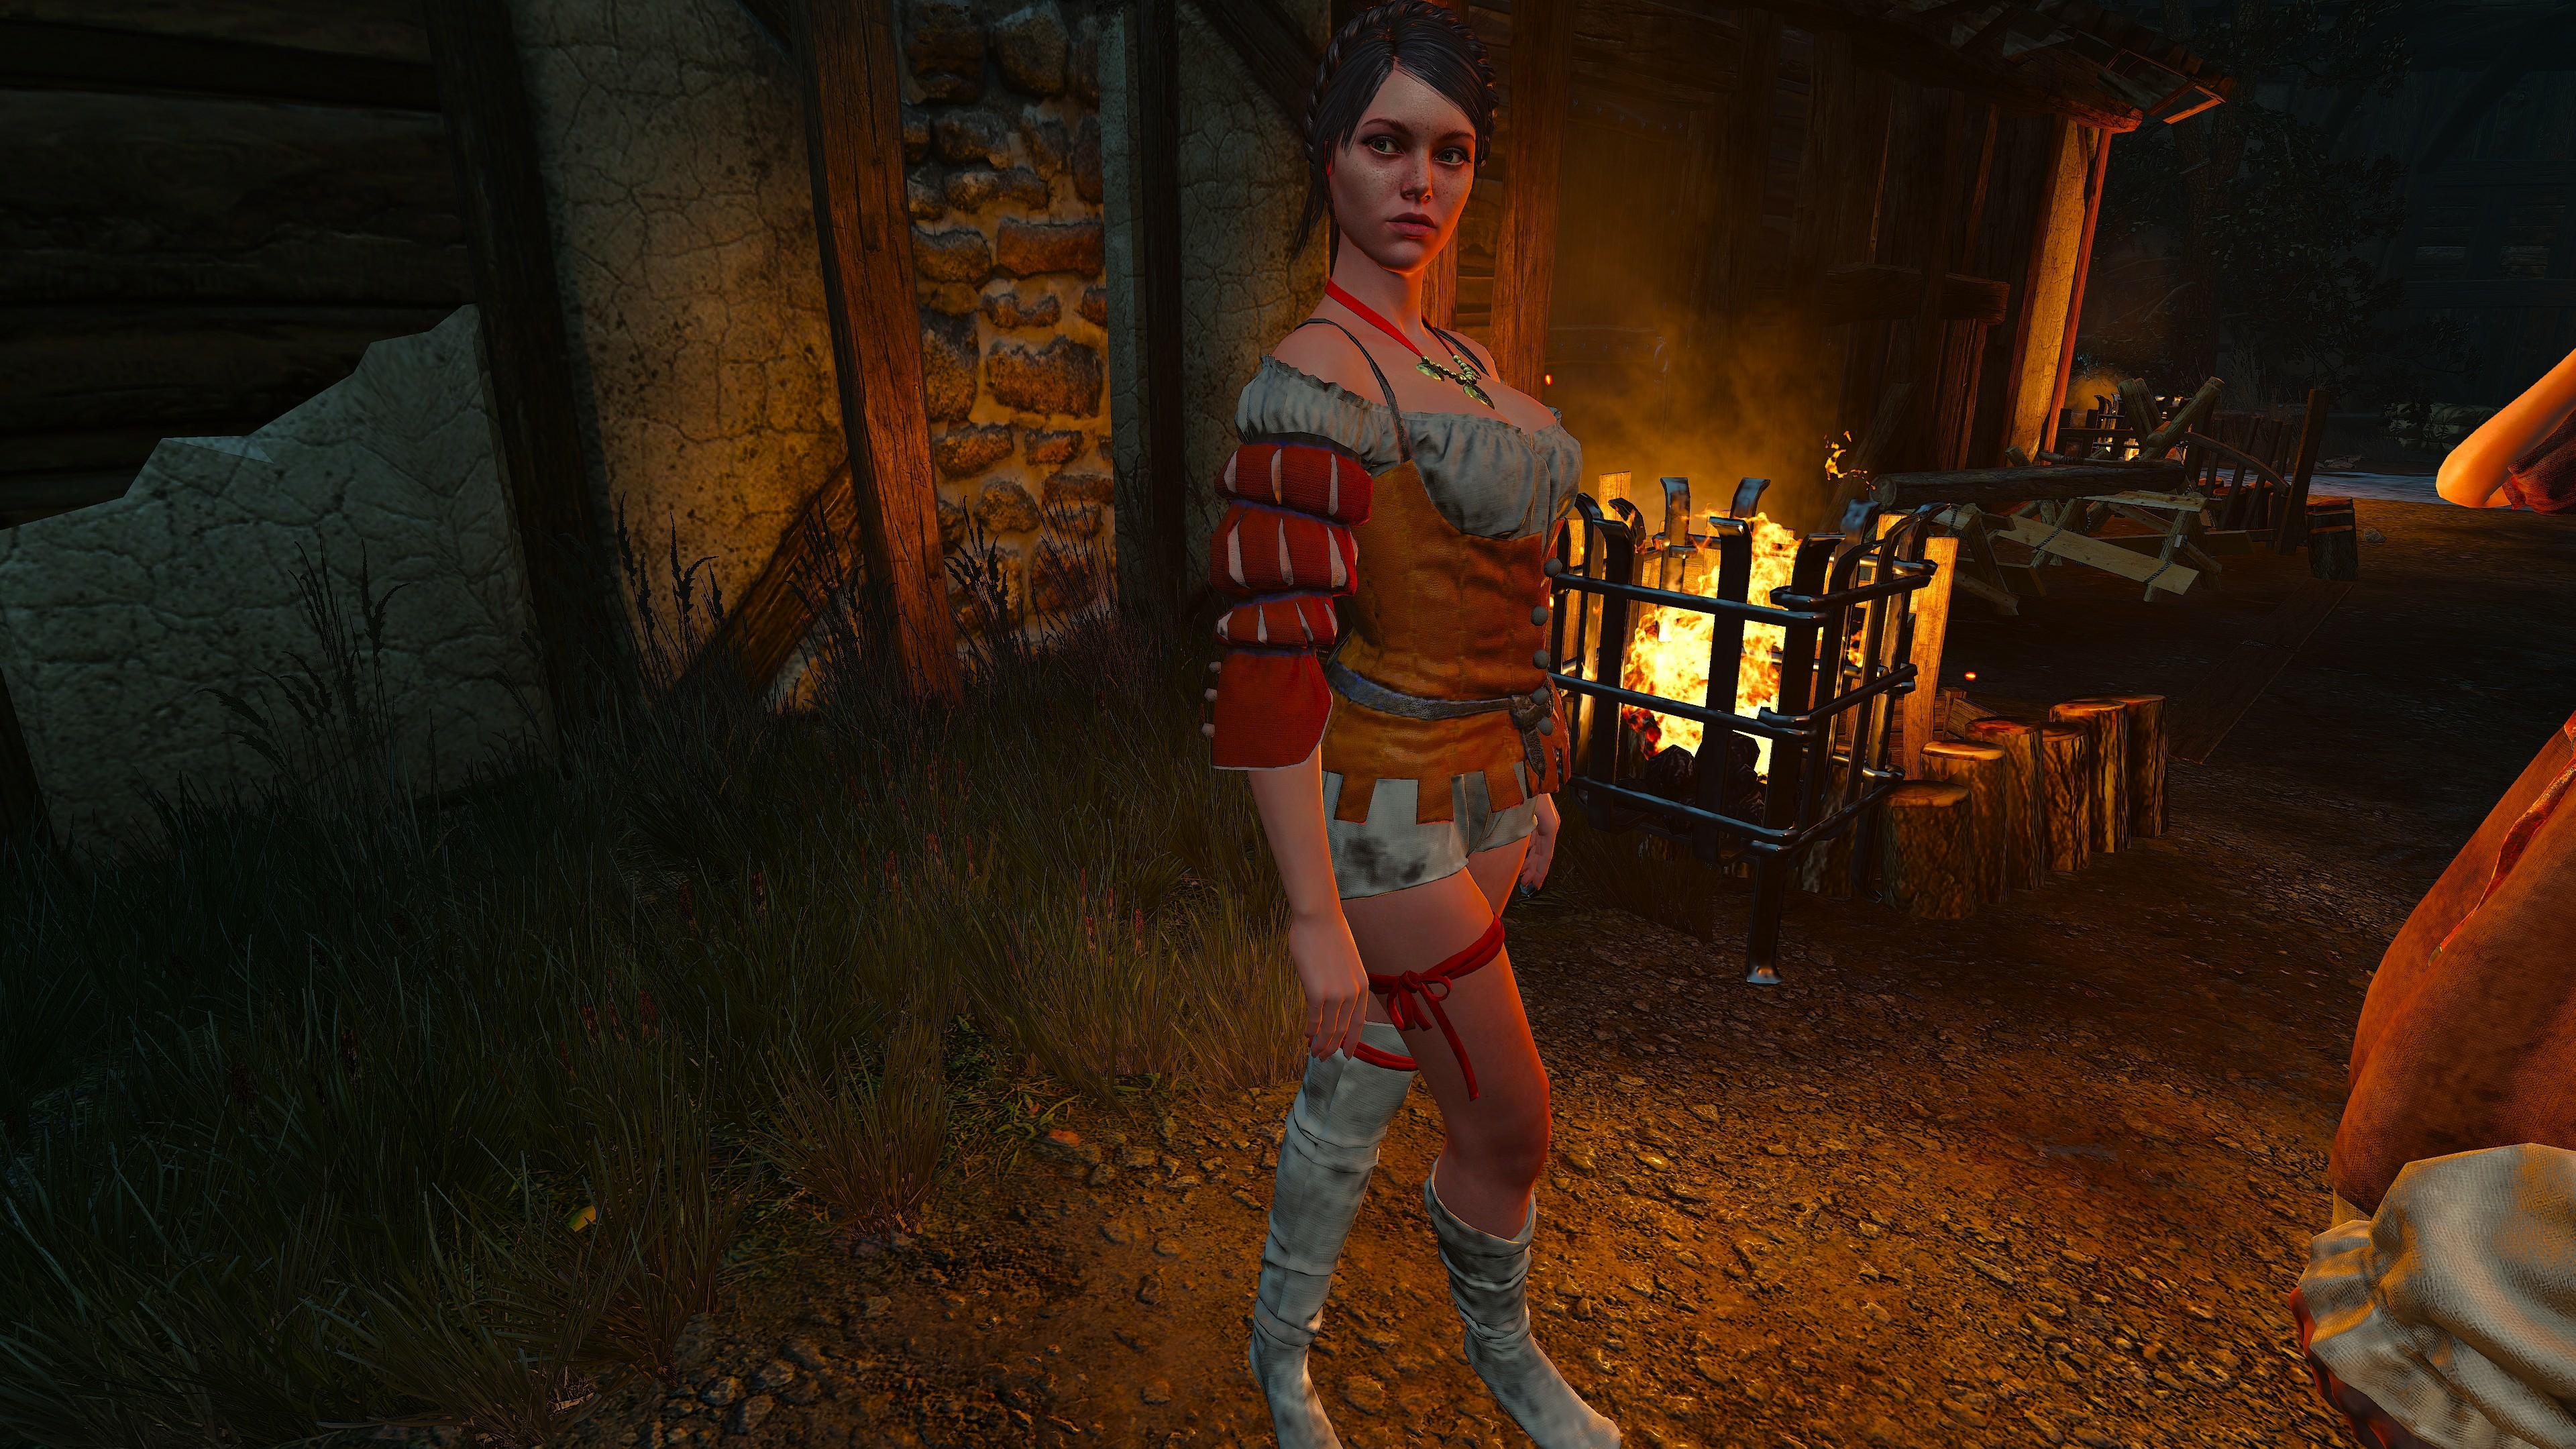 The Witcher 3 Screenshot 2020.07.26 - 11.24.47.jpg - The Witcher 3: Wild Hunt